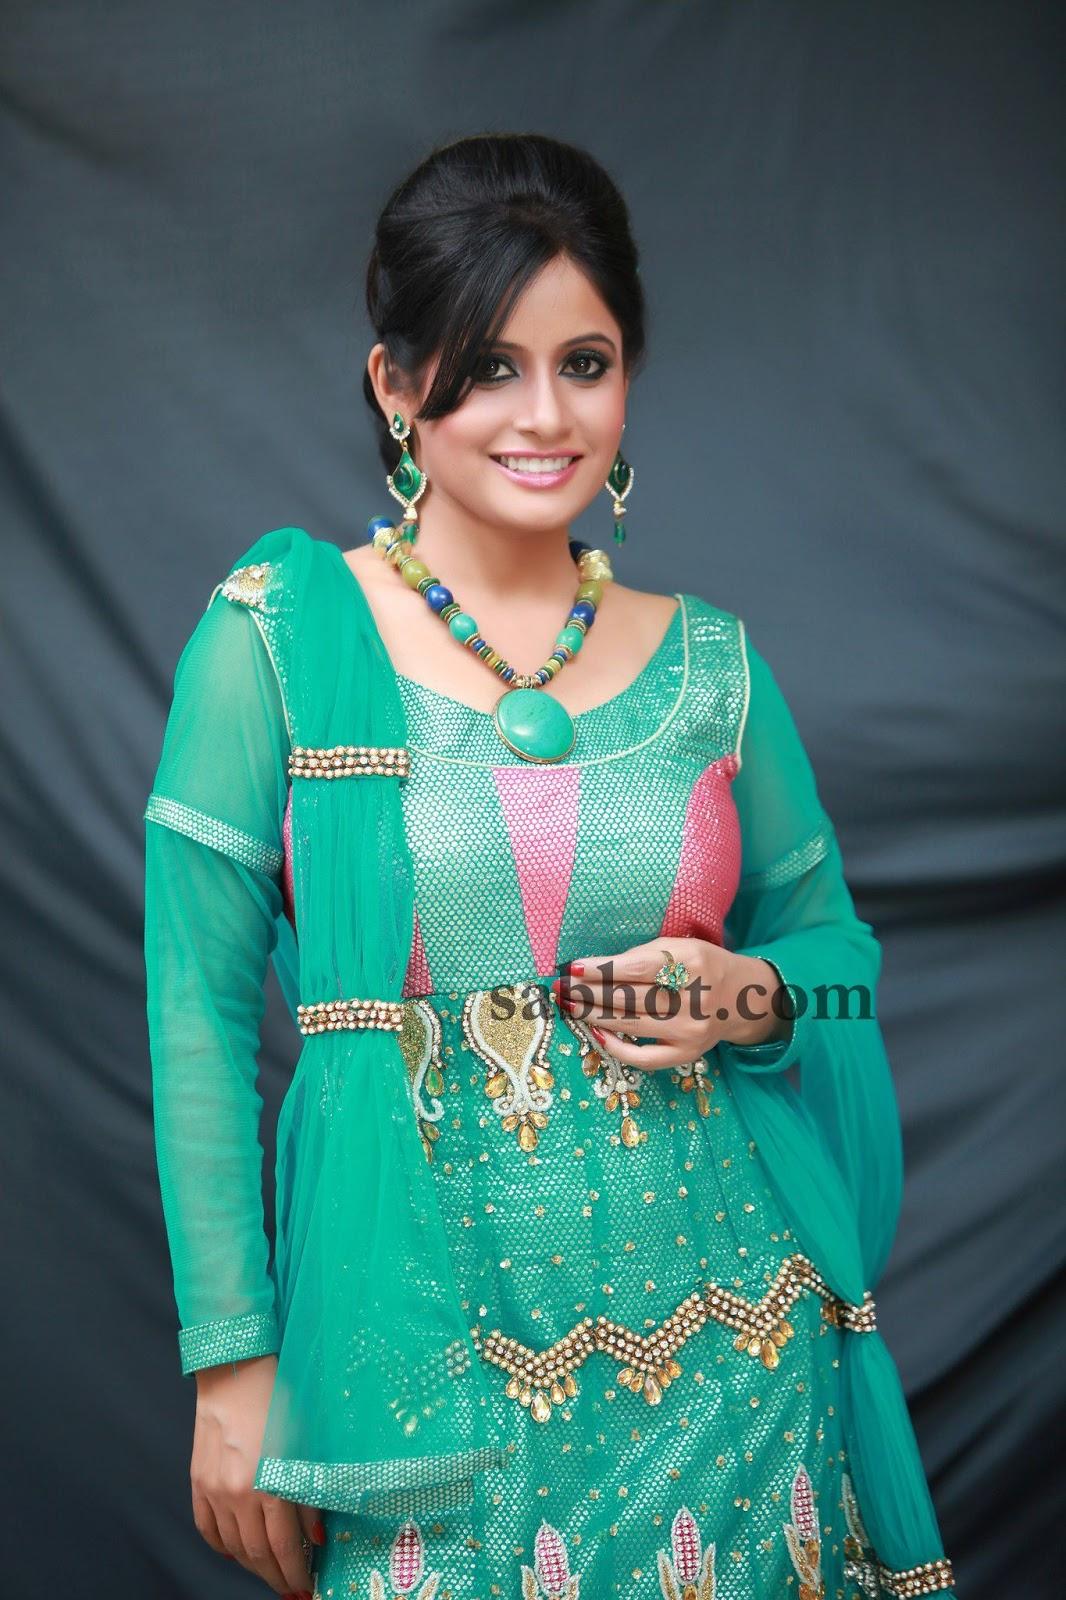 Miss Poojas Unseen Photos - Sabwoodcom-1847